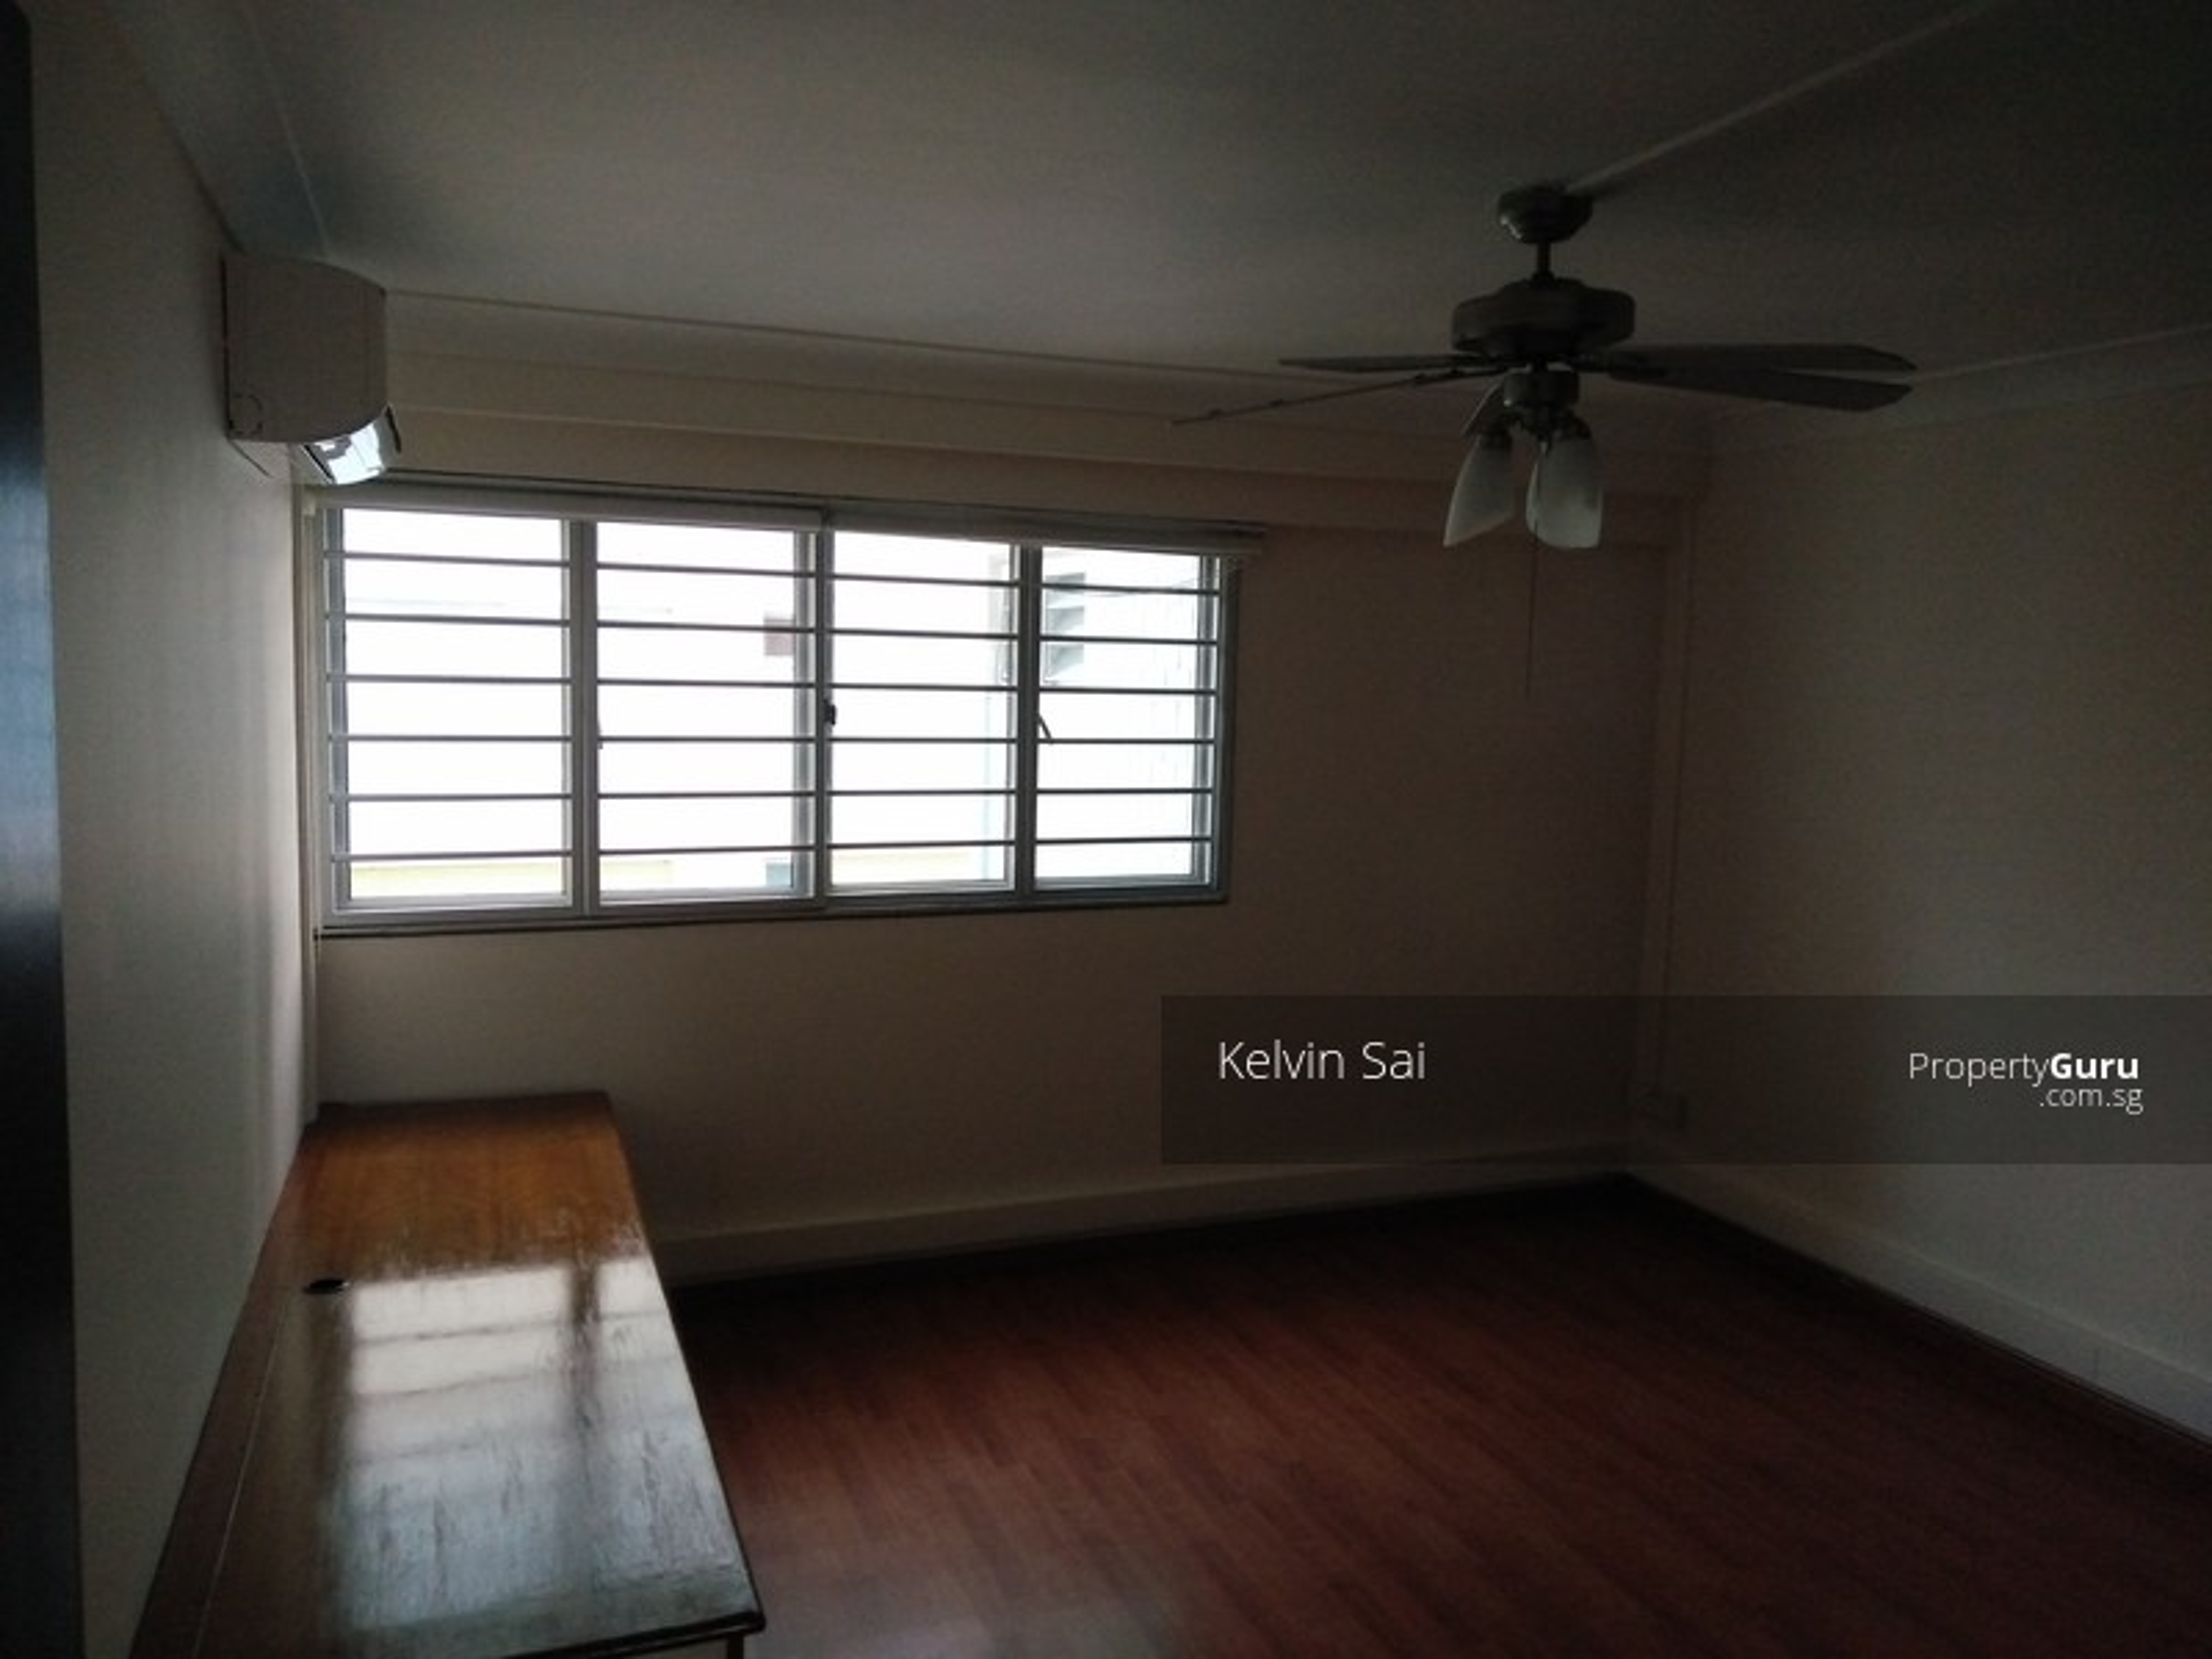 125 Bishan Street 12 125 Bishan Street 12 3 Bedrooms 1302 Sqft Hdb Flats For Rent By Kelvin